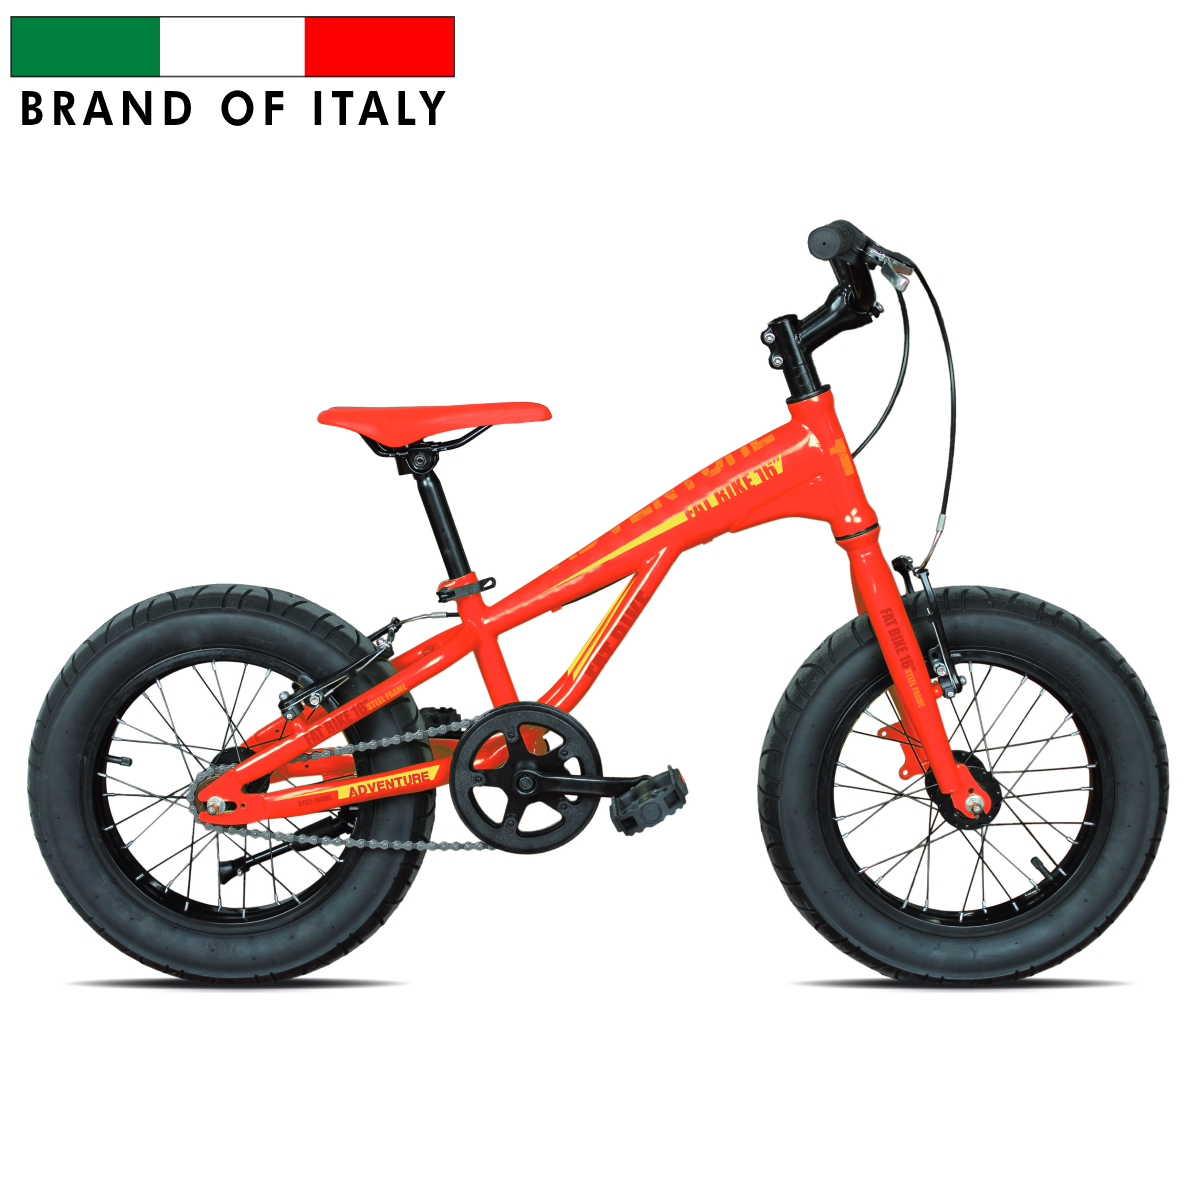 ESPERIA 9000 FAT BIKE 16'' RED/YELLOW 9016 Pilsētas velosipēds